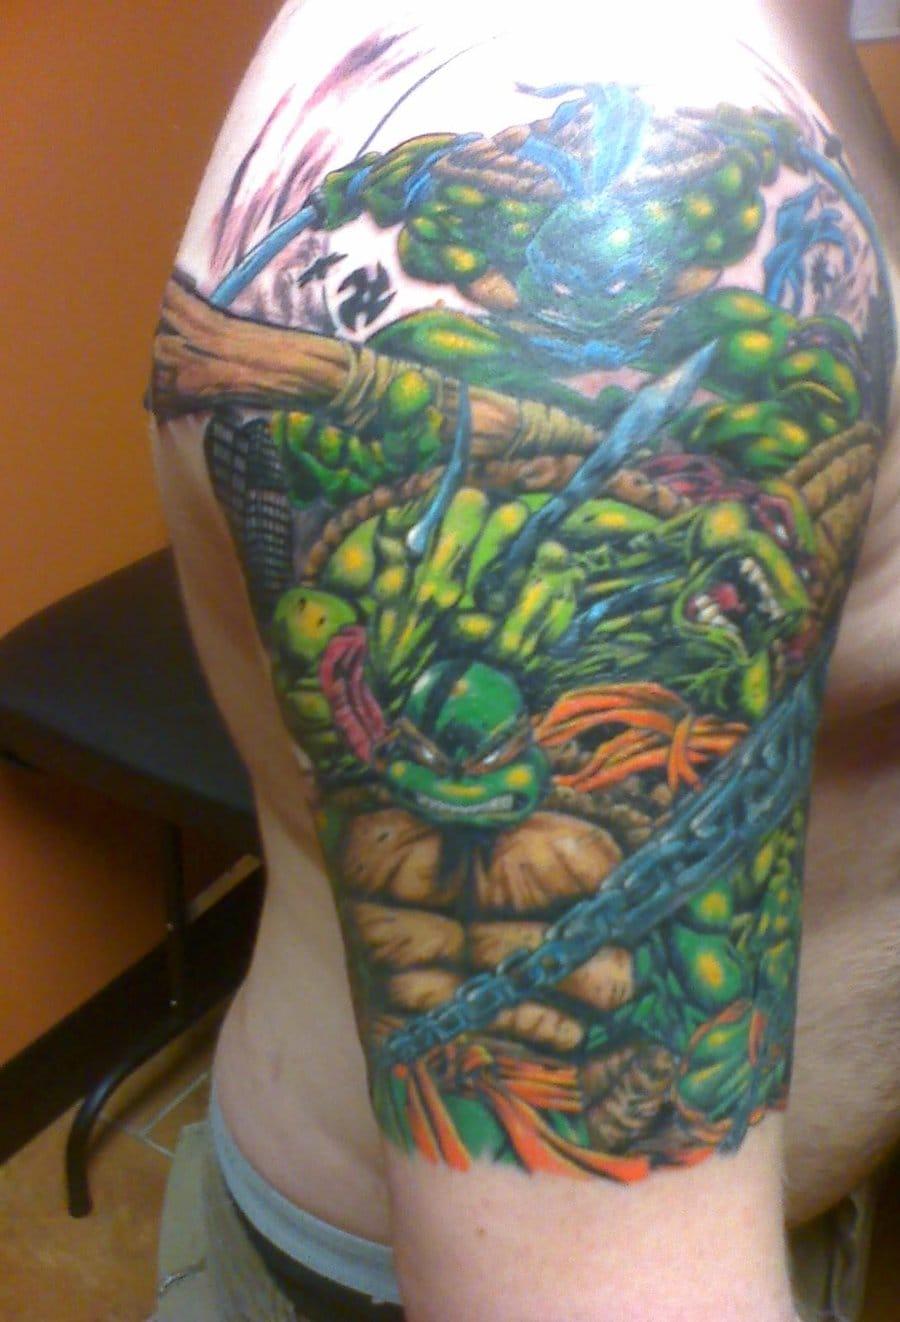 Brilliant half sleeve by Hiroxx